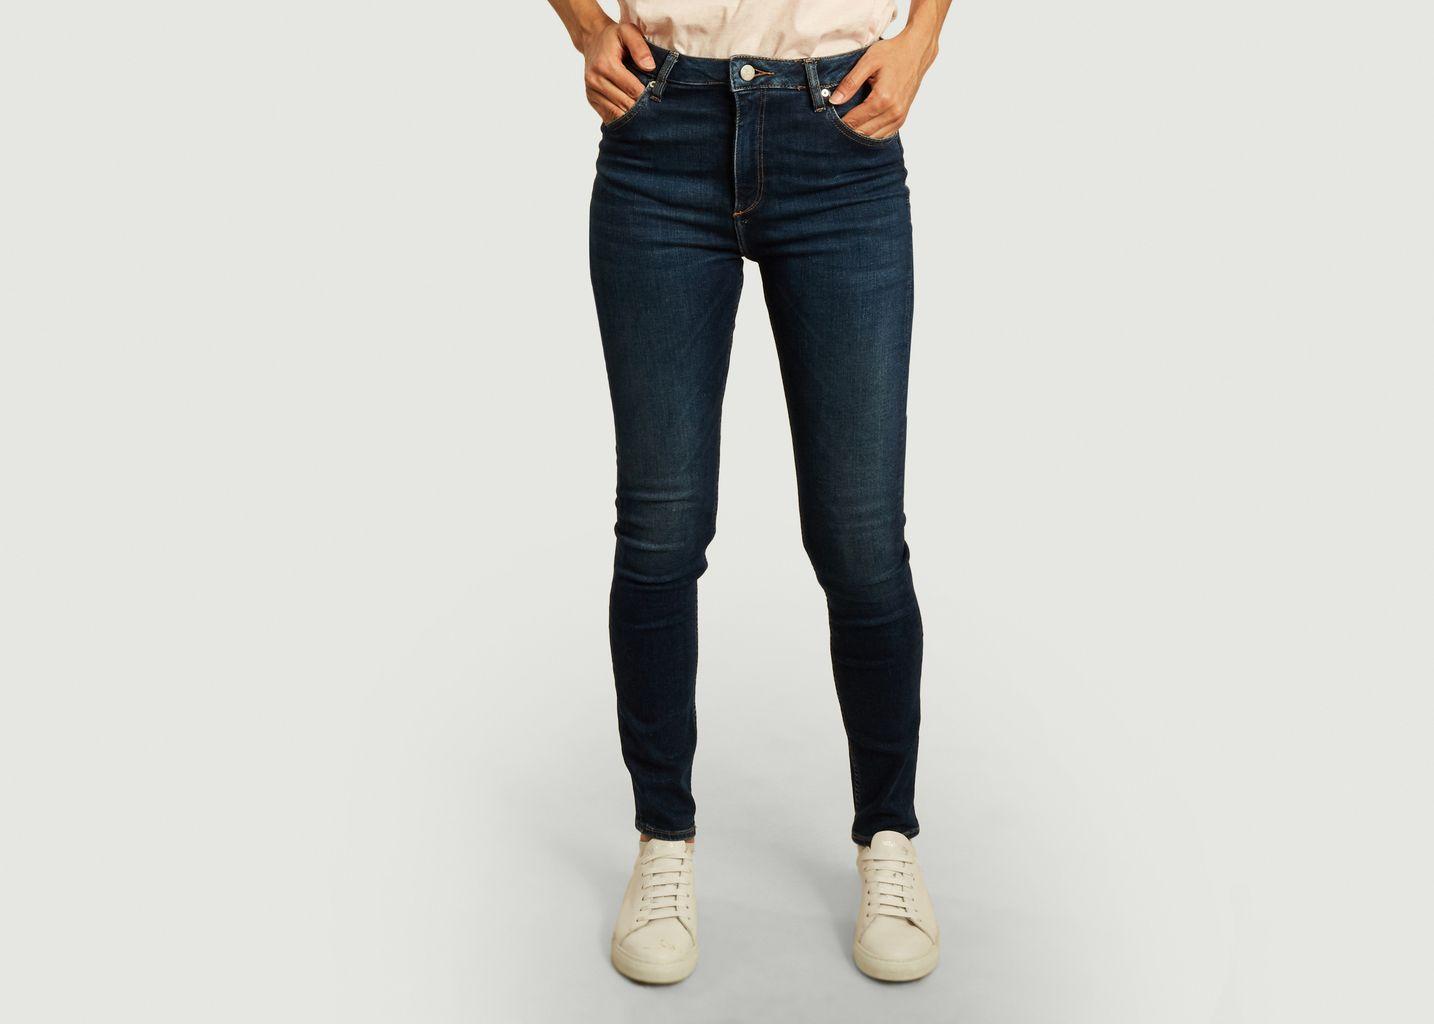 Jean brut skinny taille haute Arnel - Reiko